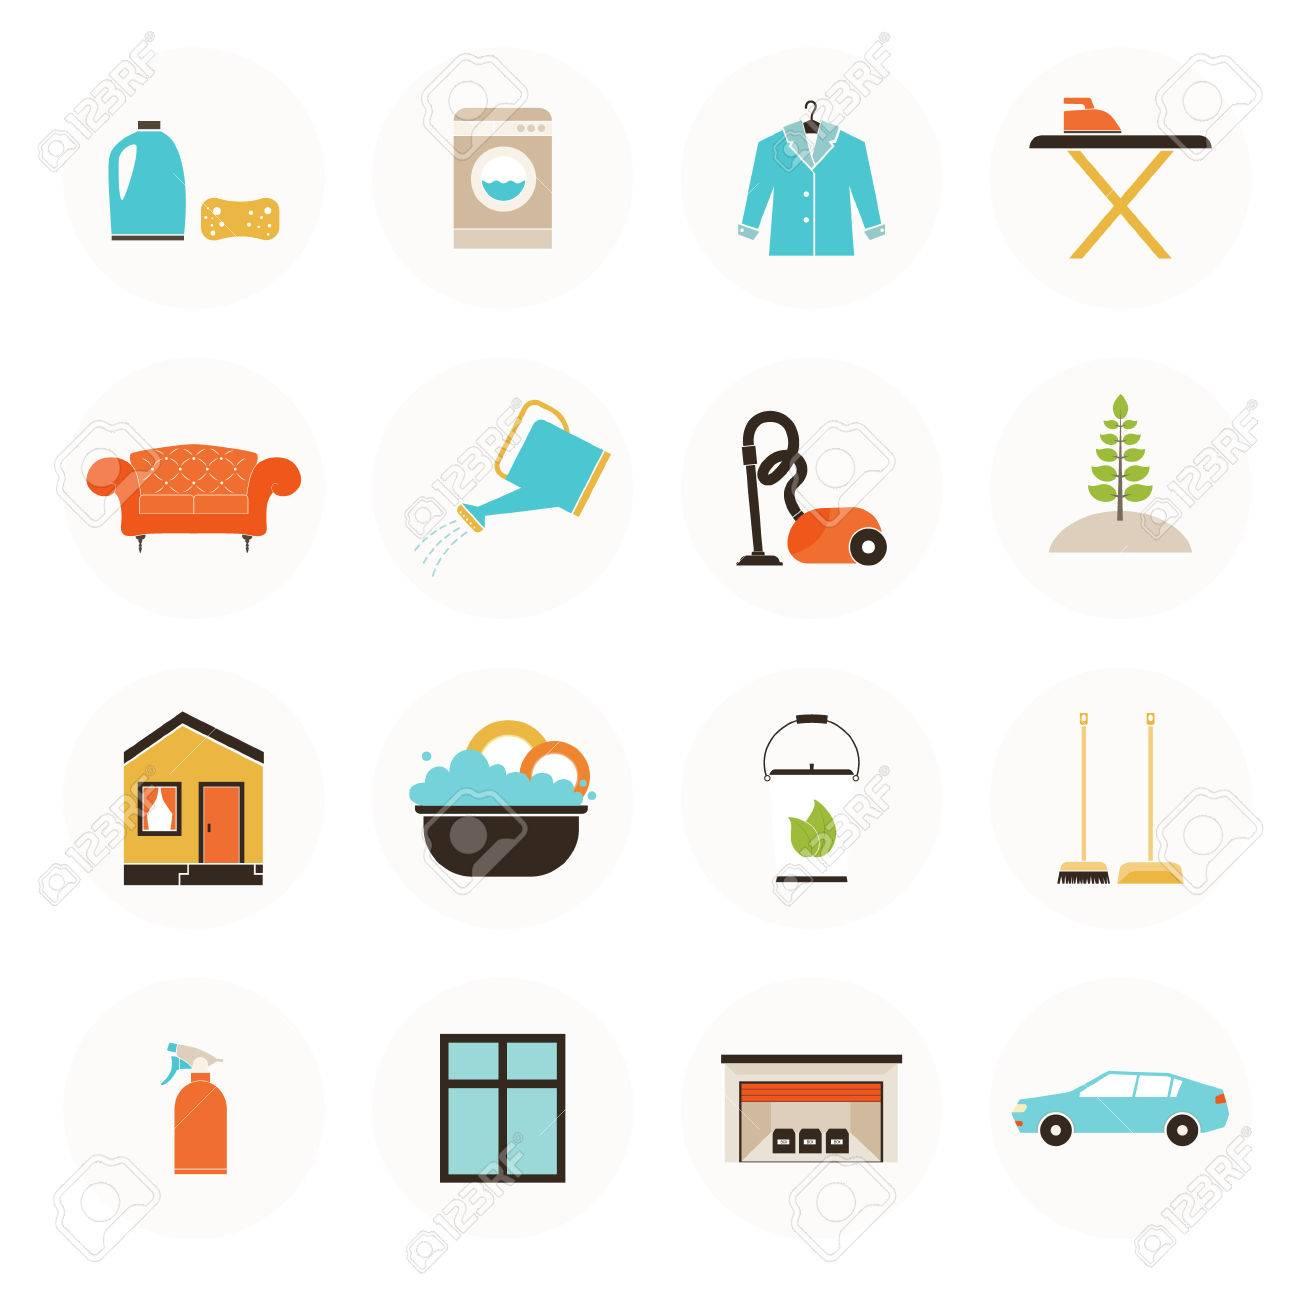 Set Of Modern Housekeeping Icons, Including Vacuum Cleaning, Carpet Clean,  Window, Garage